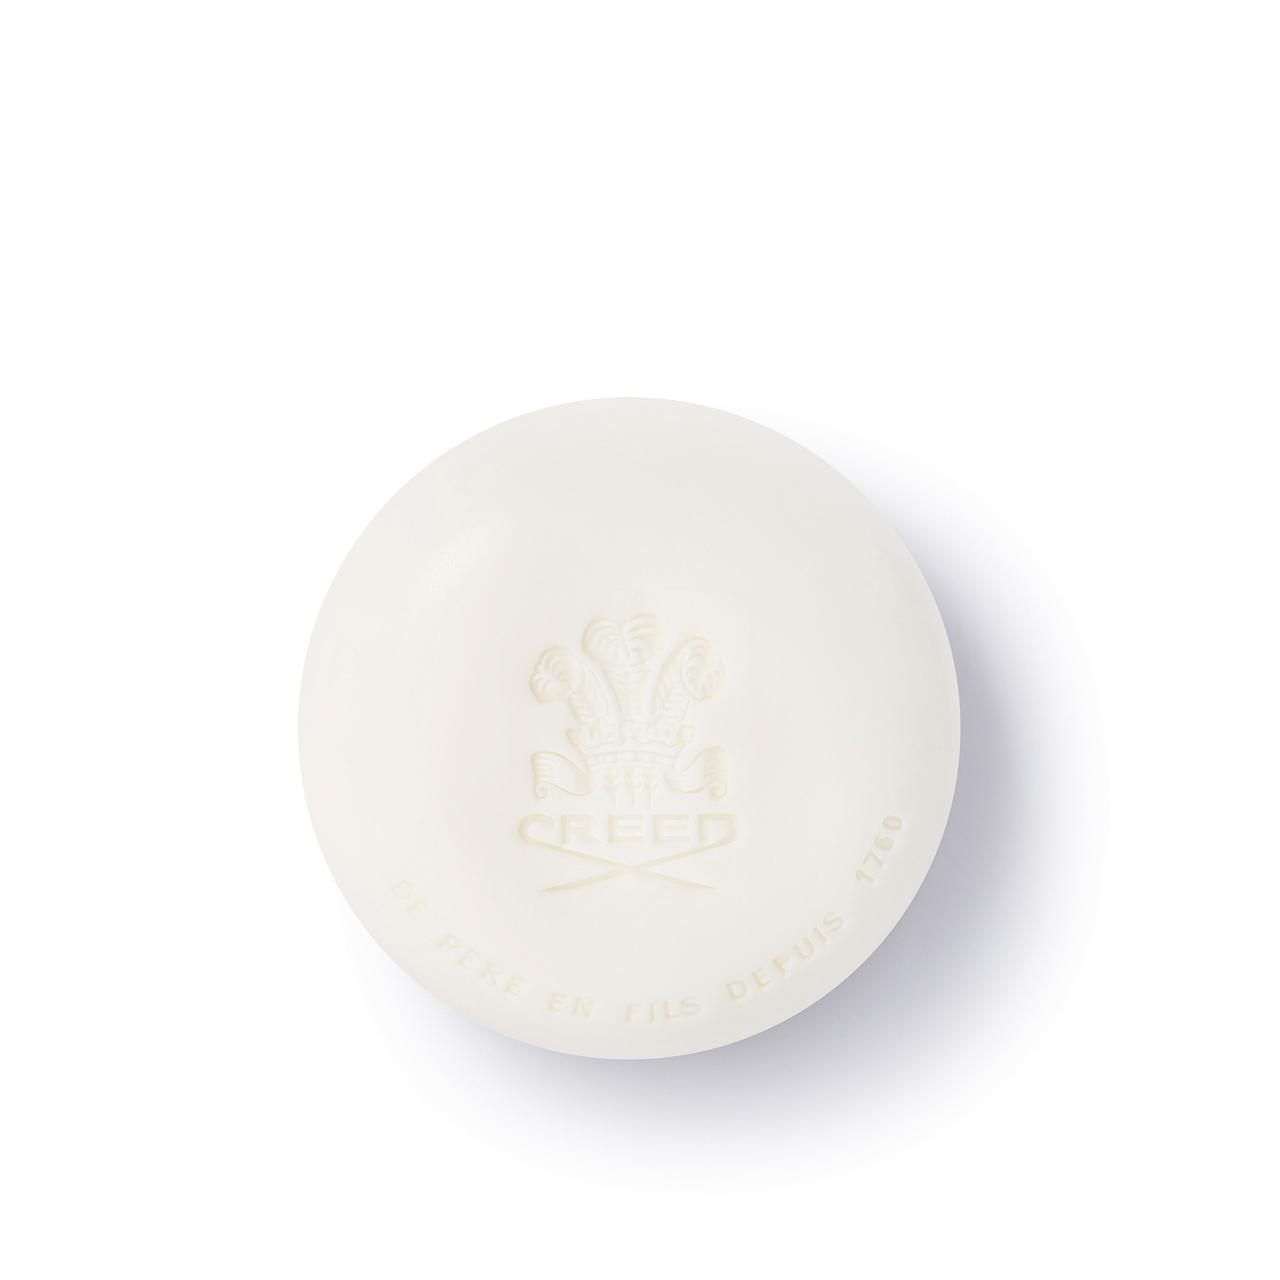 Aventus - Bath Soap